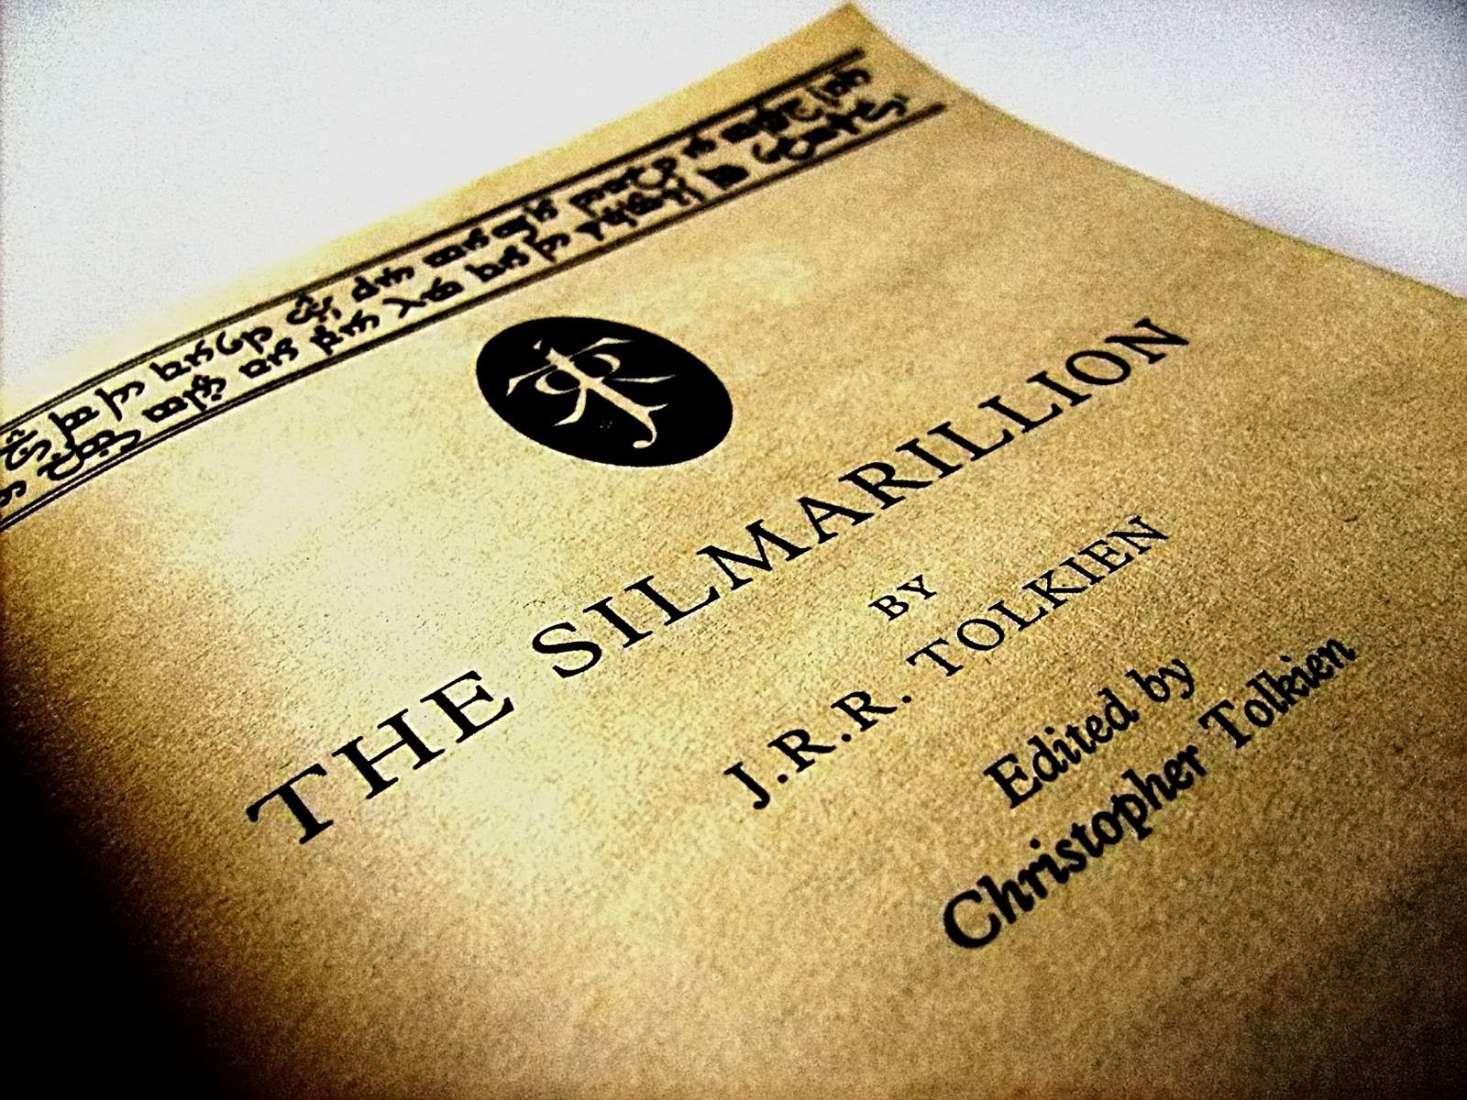 Contra-capa do livro O Silmarillion do autor J. R. R. Tolkien.